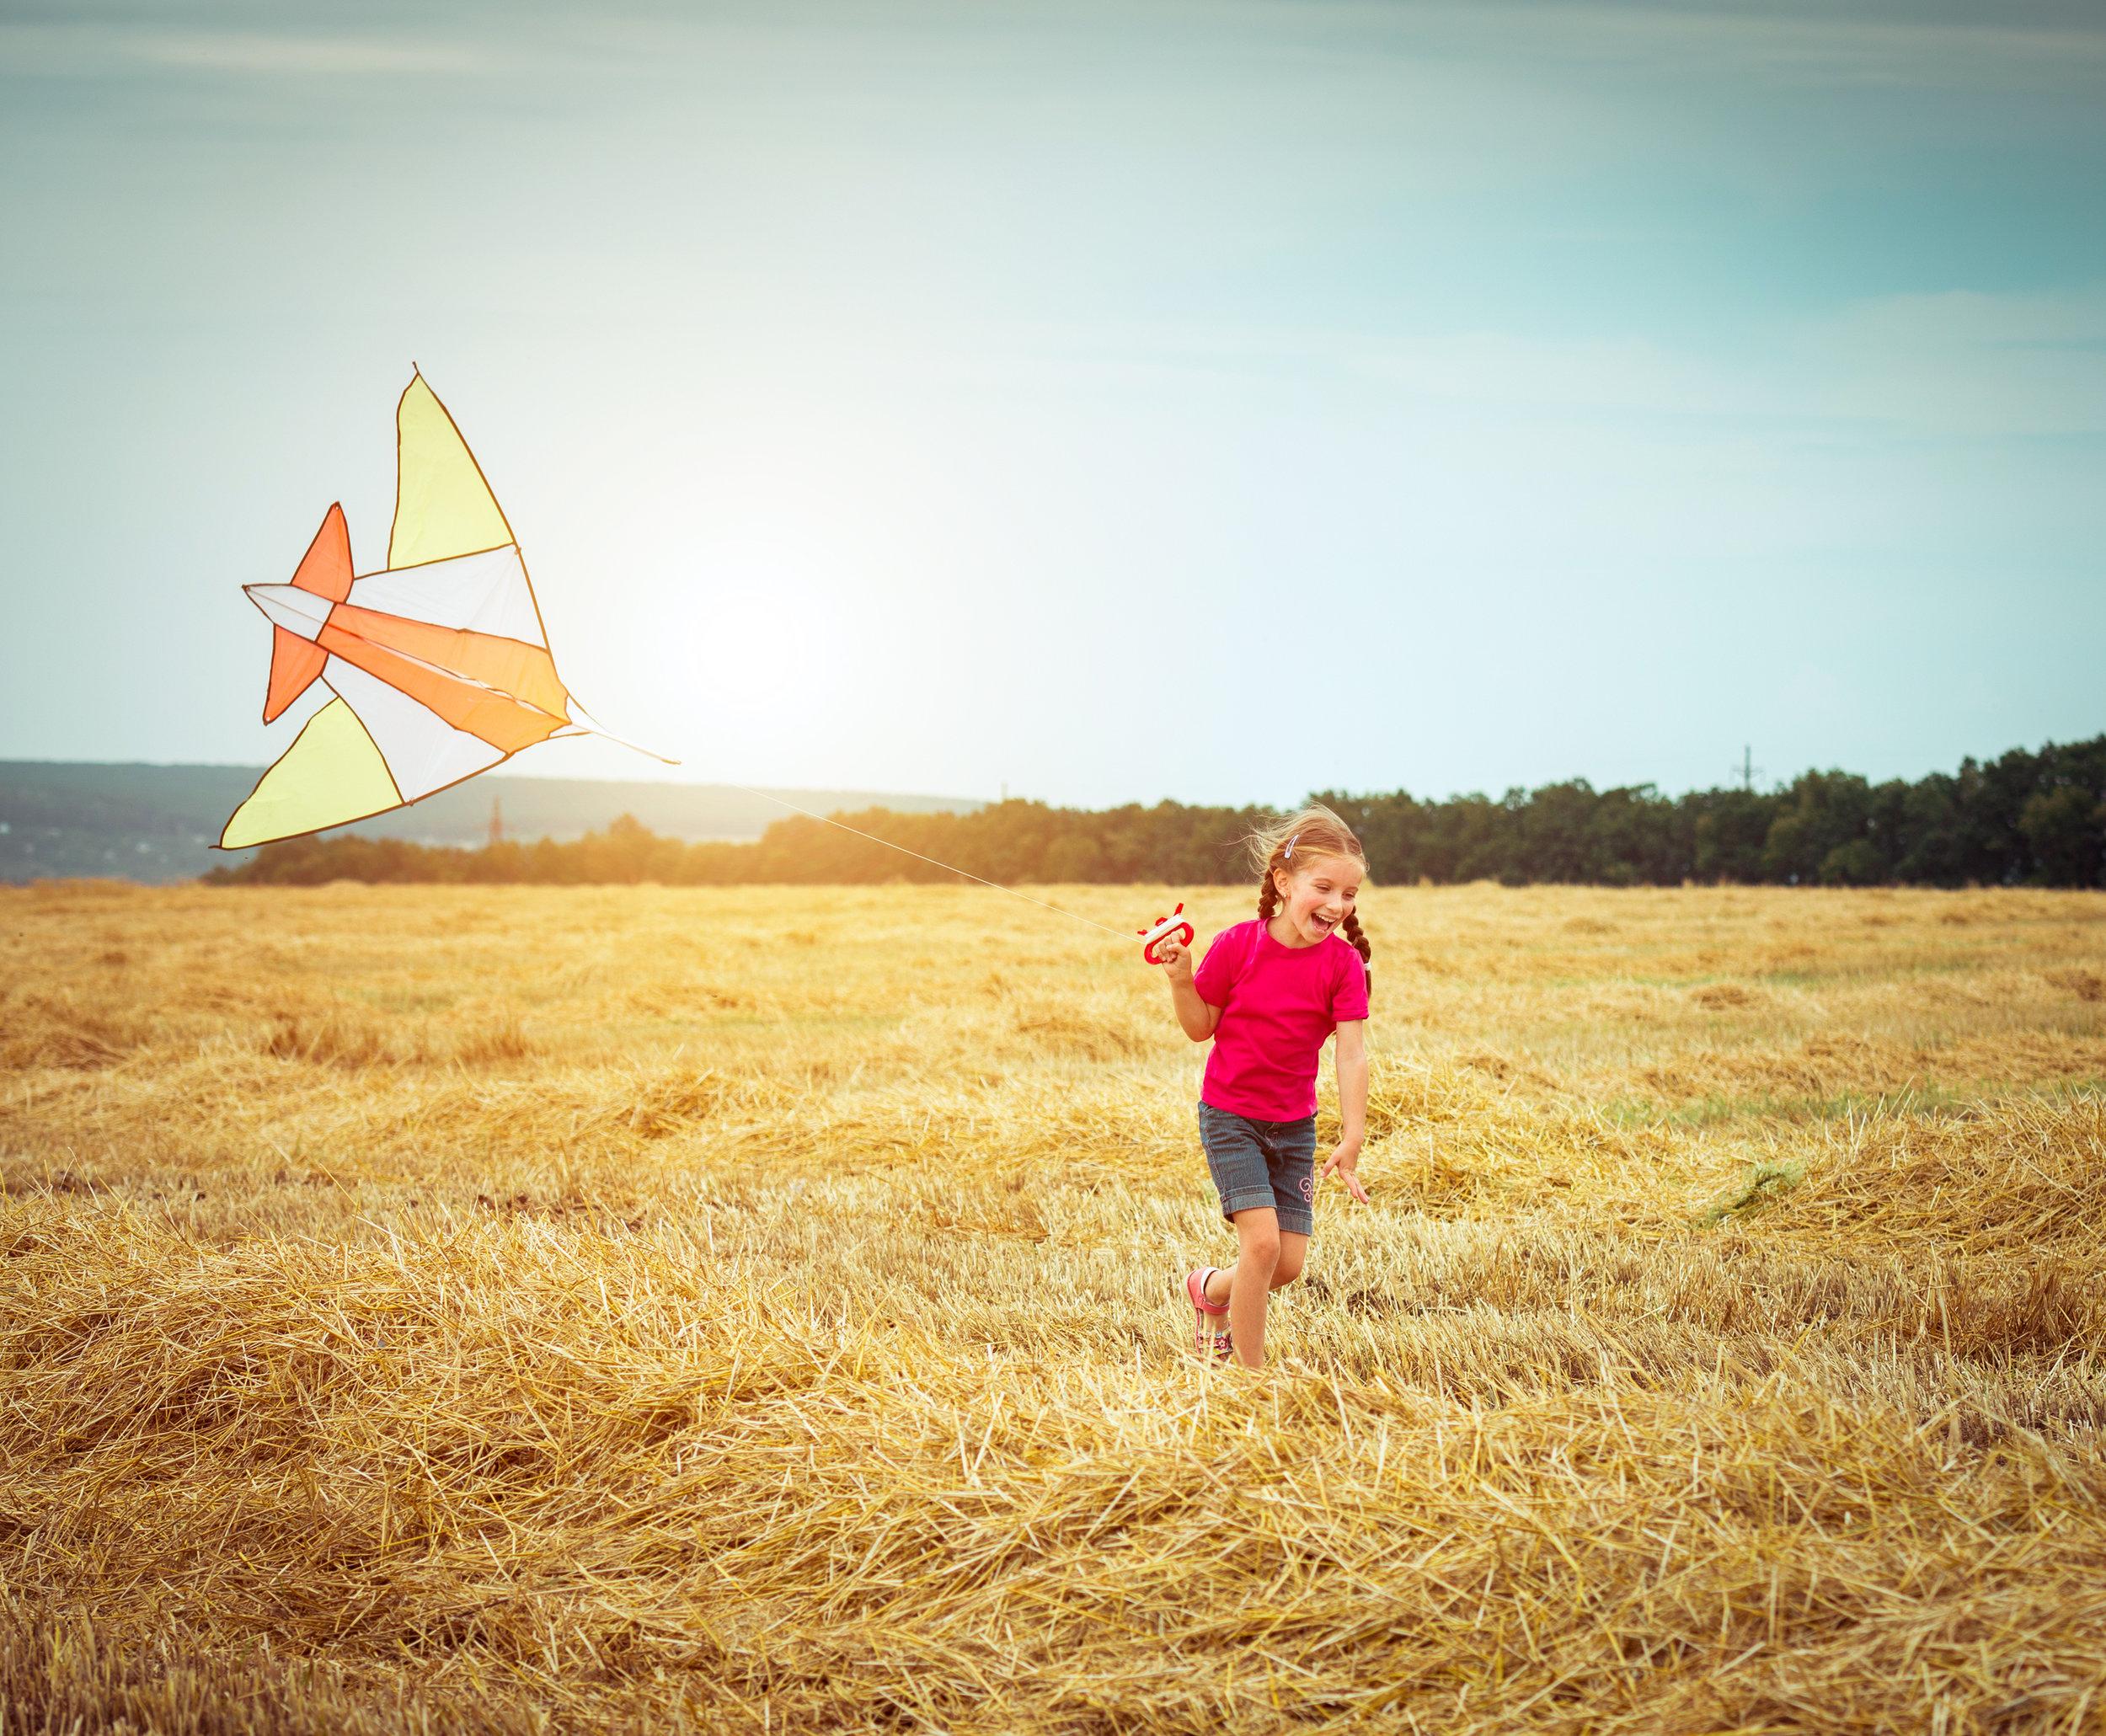 bigstock-happy-little-girl-witha-kite-i-74487529.jpg